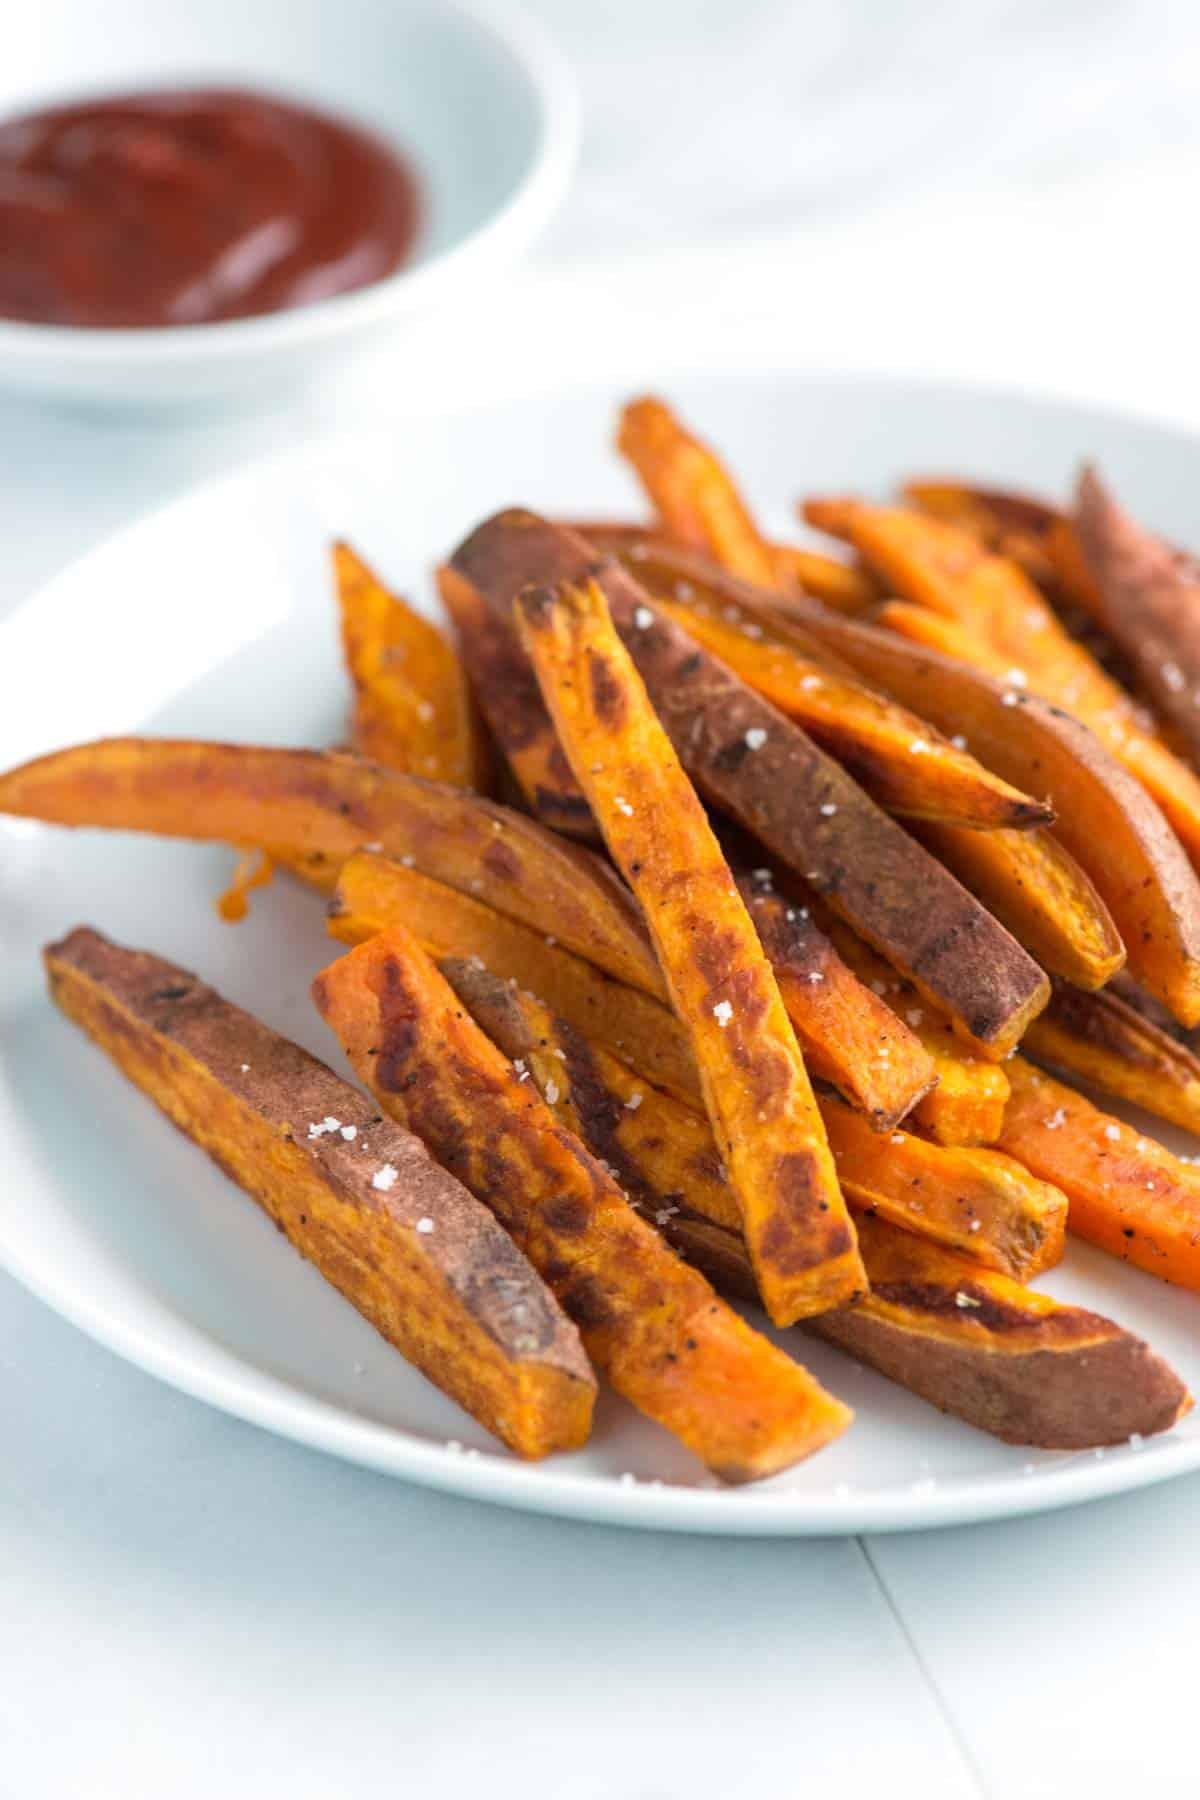 Best Sweet Potato Fries  Easy Homemade Baked Sweet Potato Fries Recipe